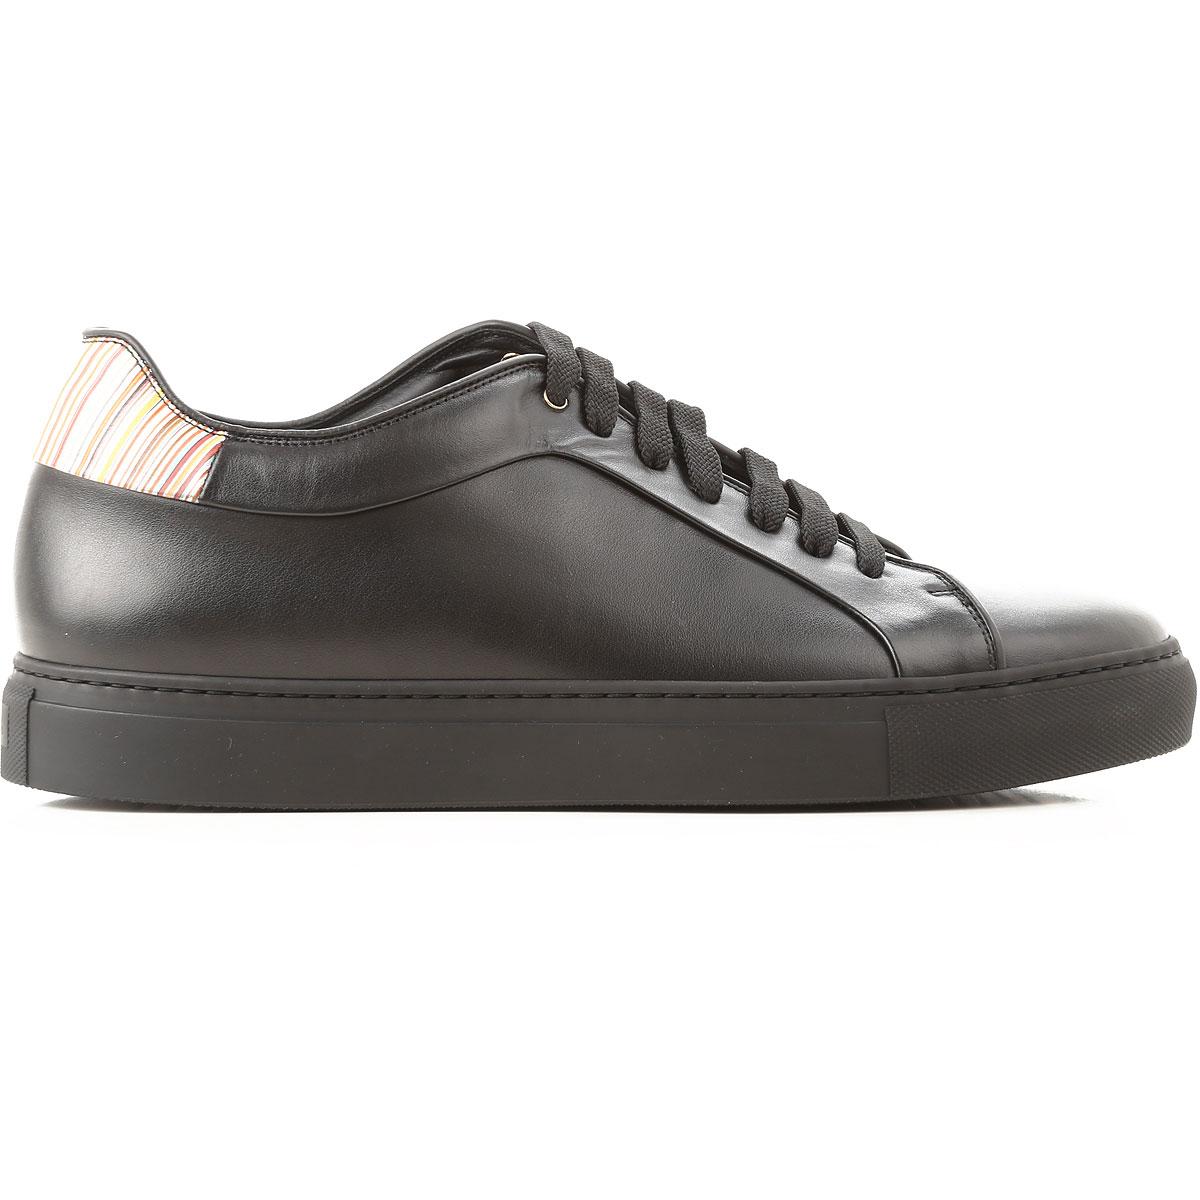 Scarpe Uomo Sneakers Paul Smith Offerte Limitate